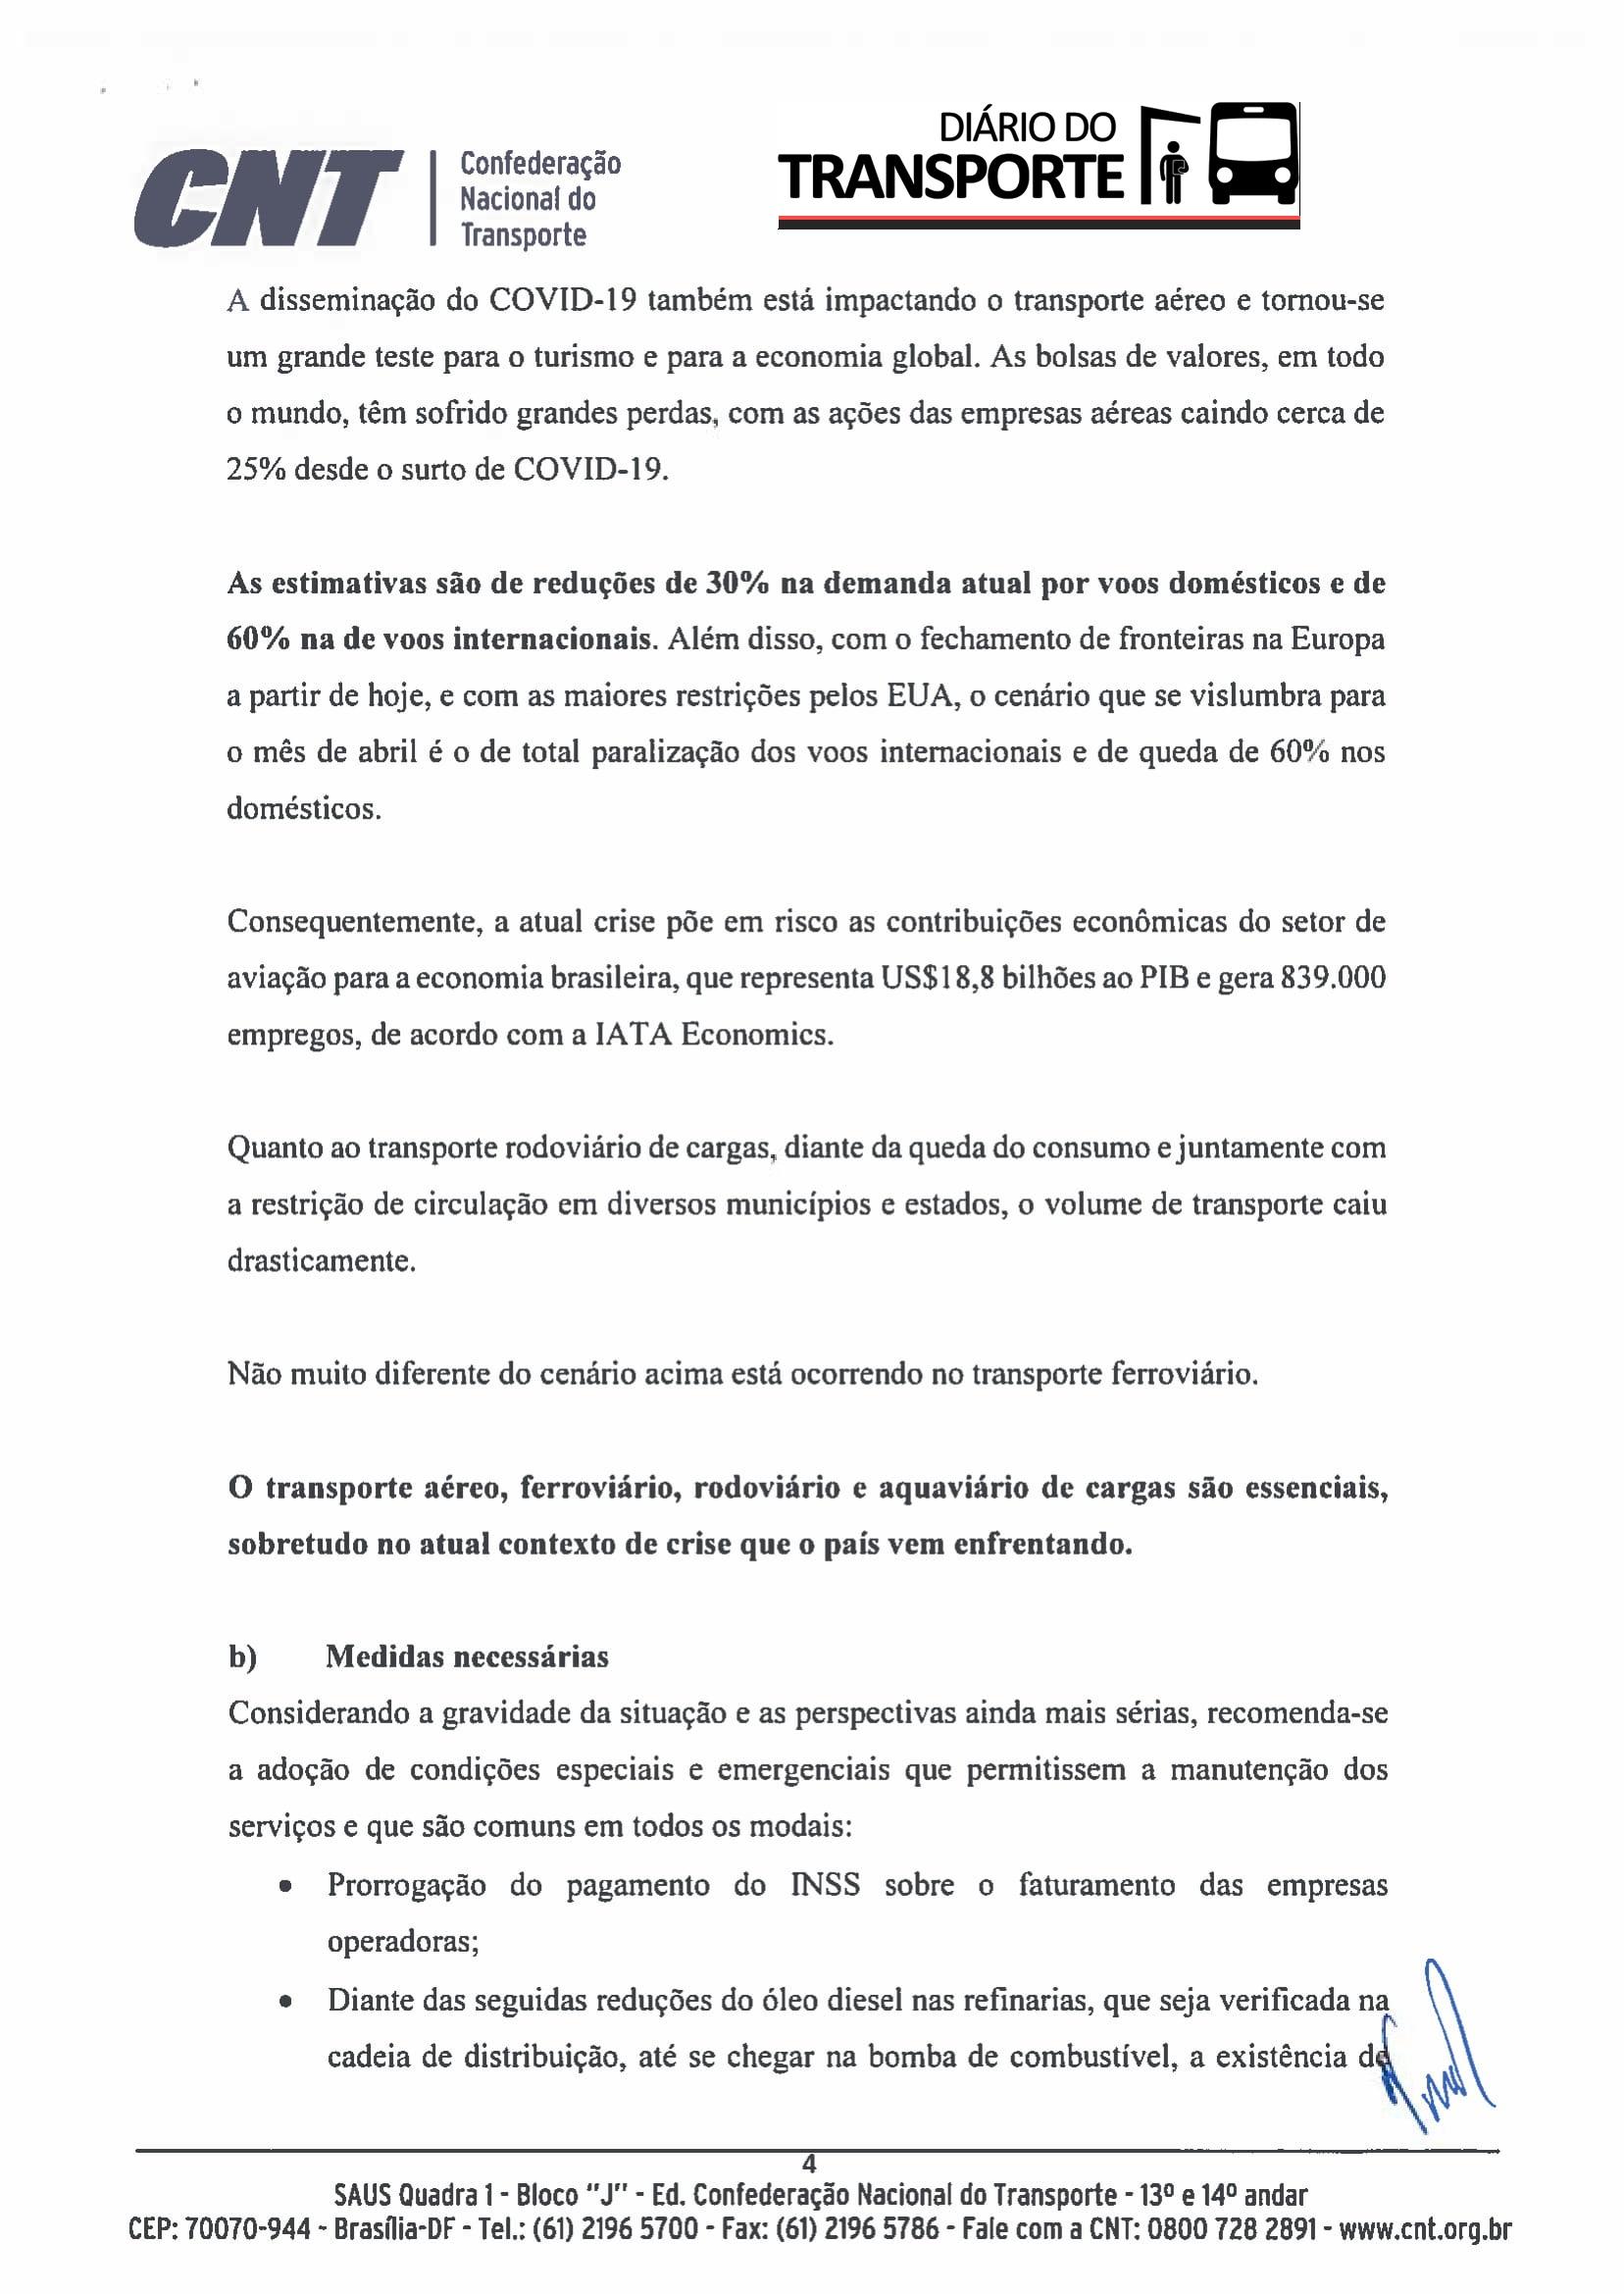 OF. CNT PRE N 054_2020.pdf-4